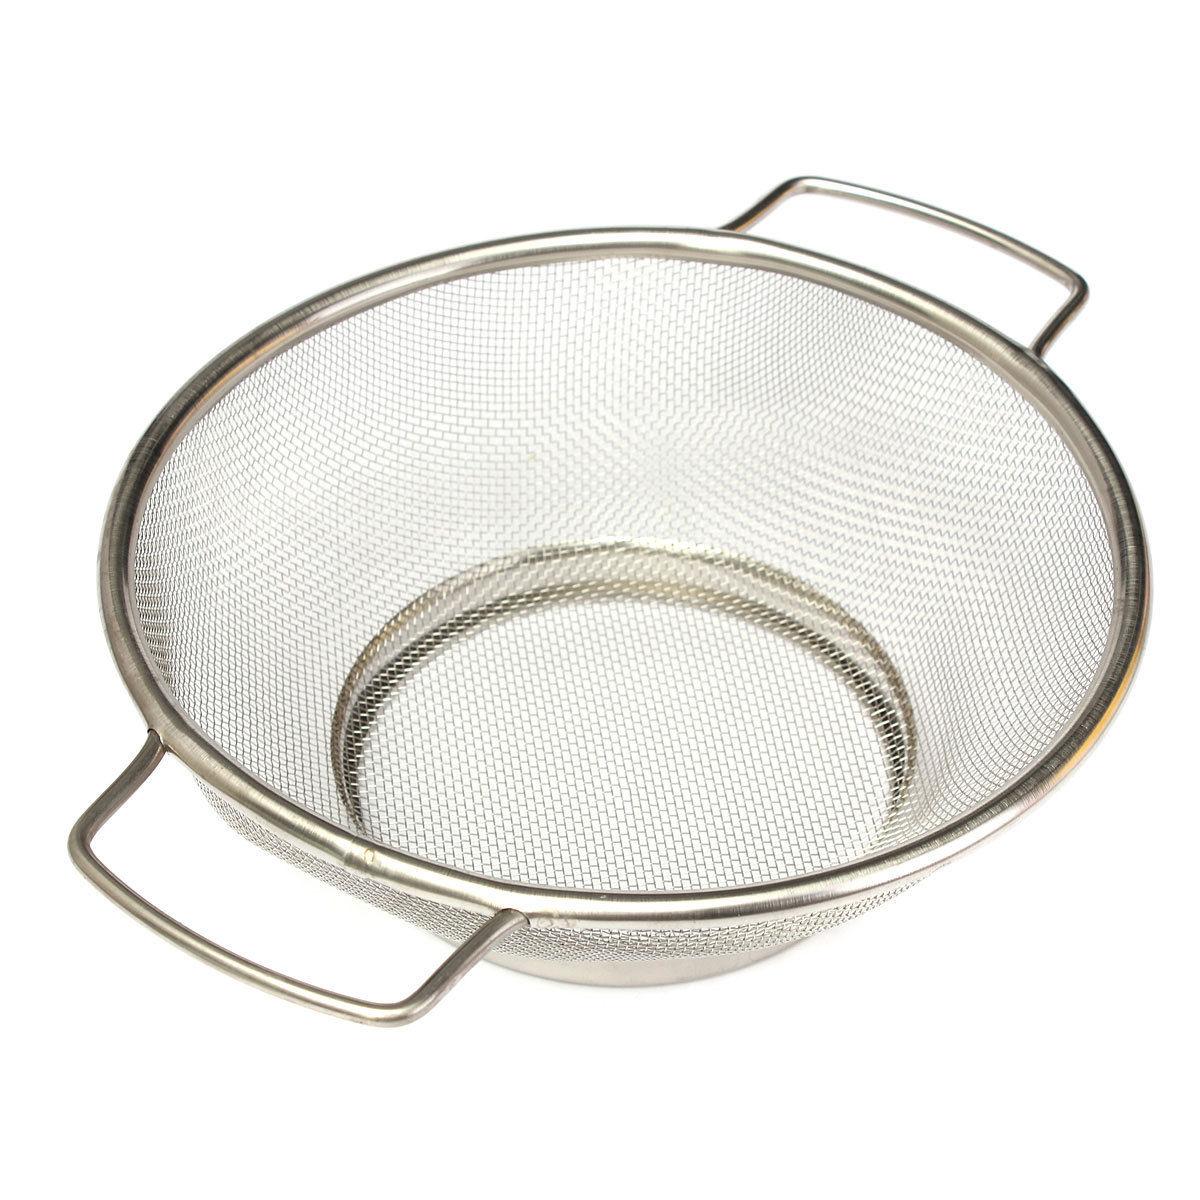 Hot saleStainless Steel Fine Mesh Strainer Bowl Drainer Vegetable Sieve Colander Sifter